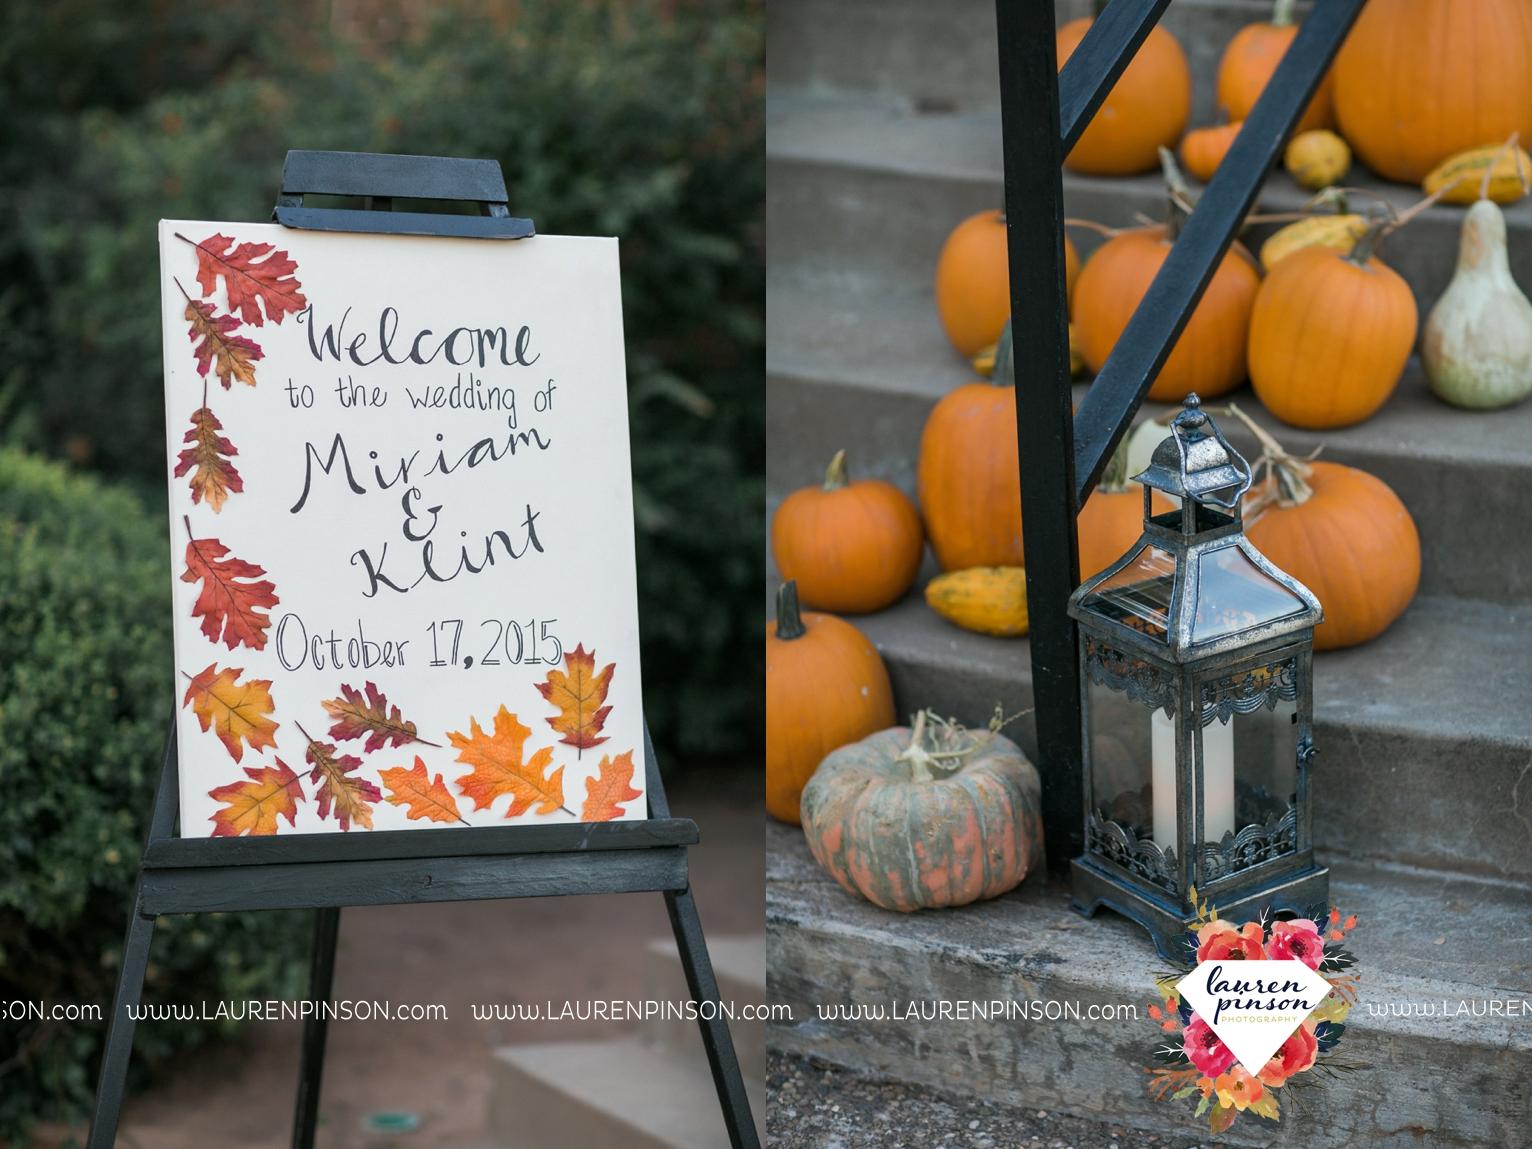 kemp-center-for-the-arts-wichita-falls-texas-wedding-photographer-fall-wedding-pumpkins-165.jpg